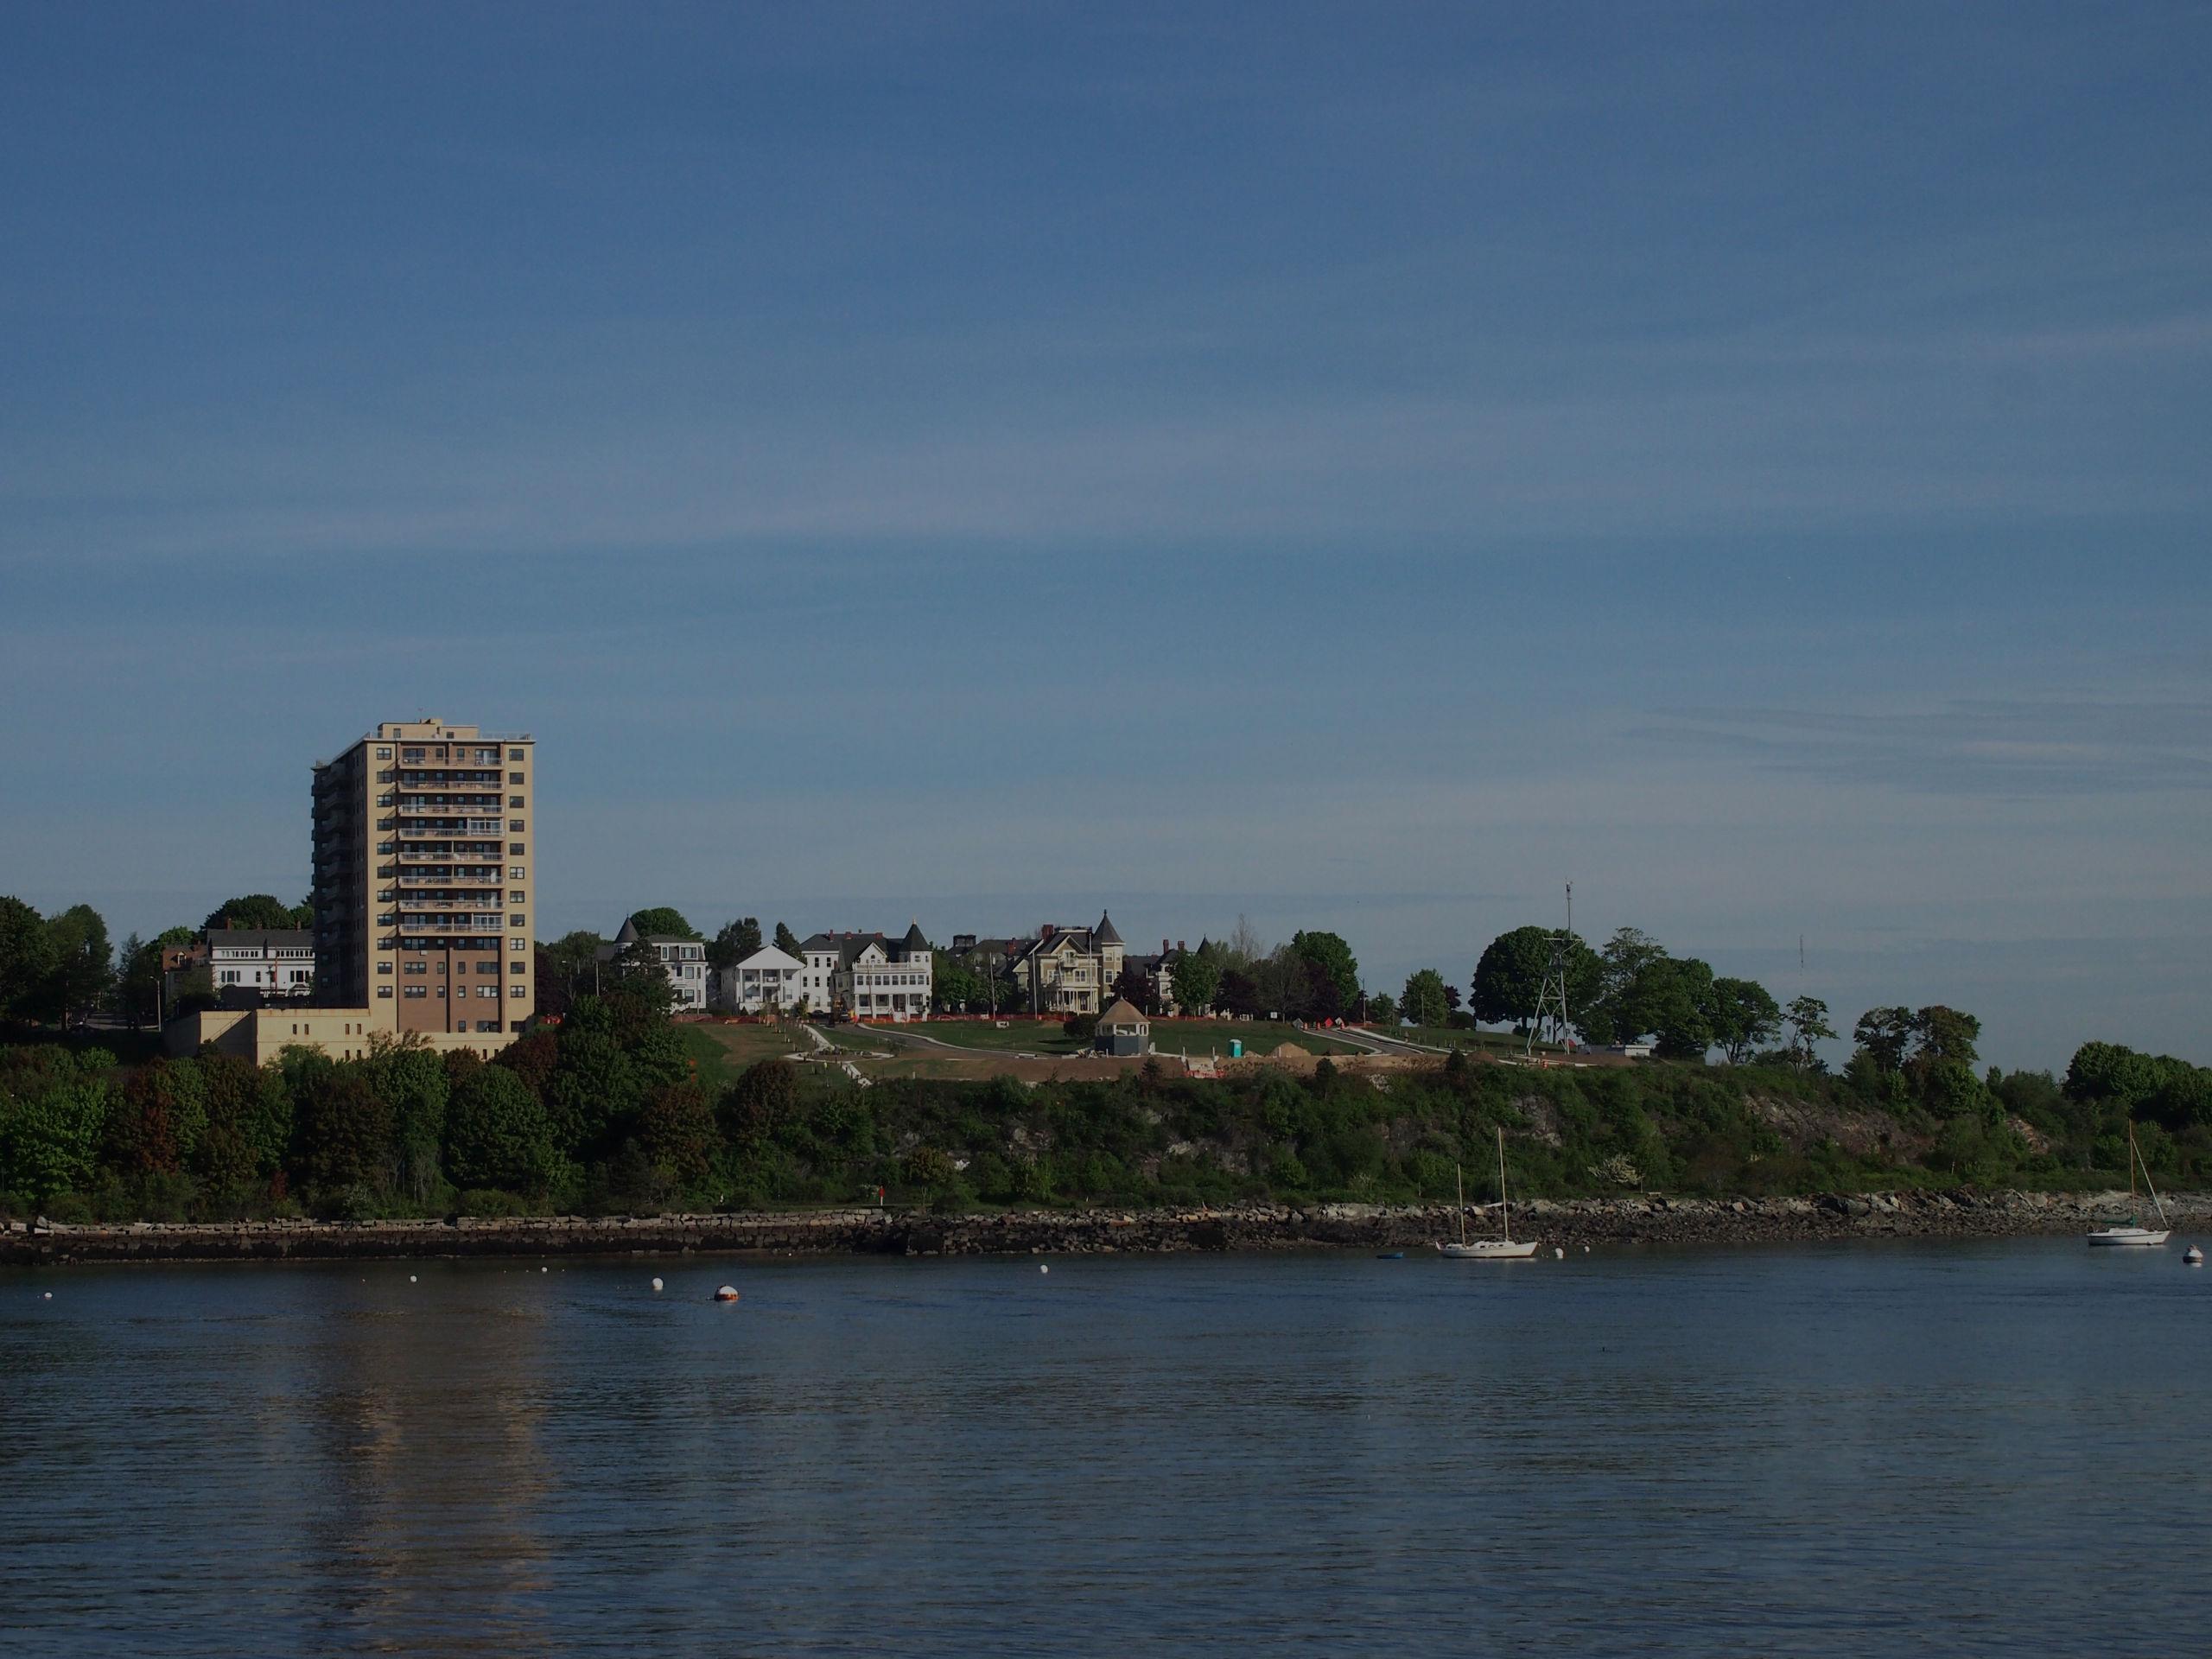 Portland's Munjoy Hill